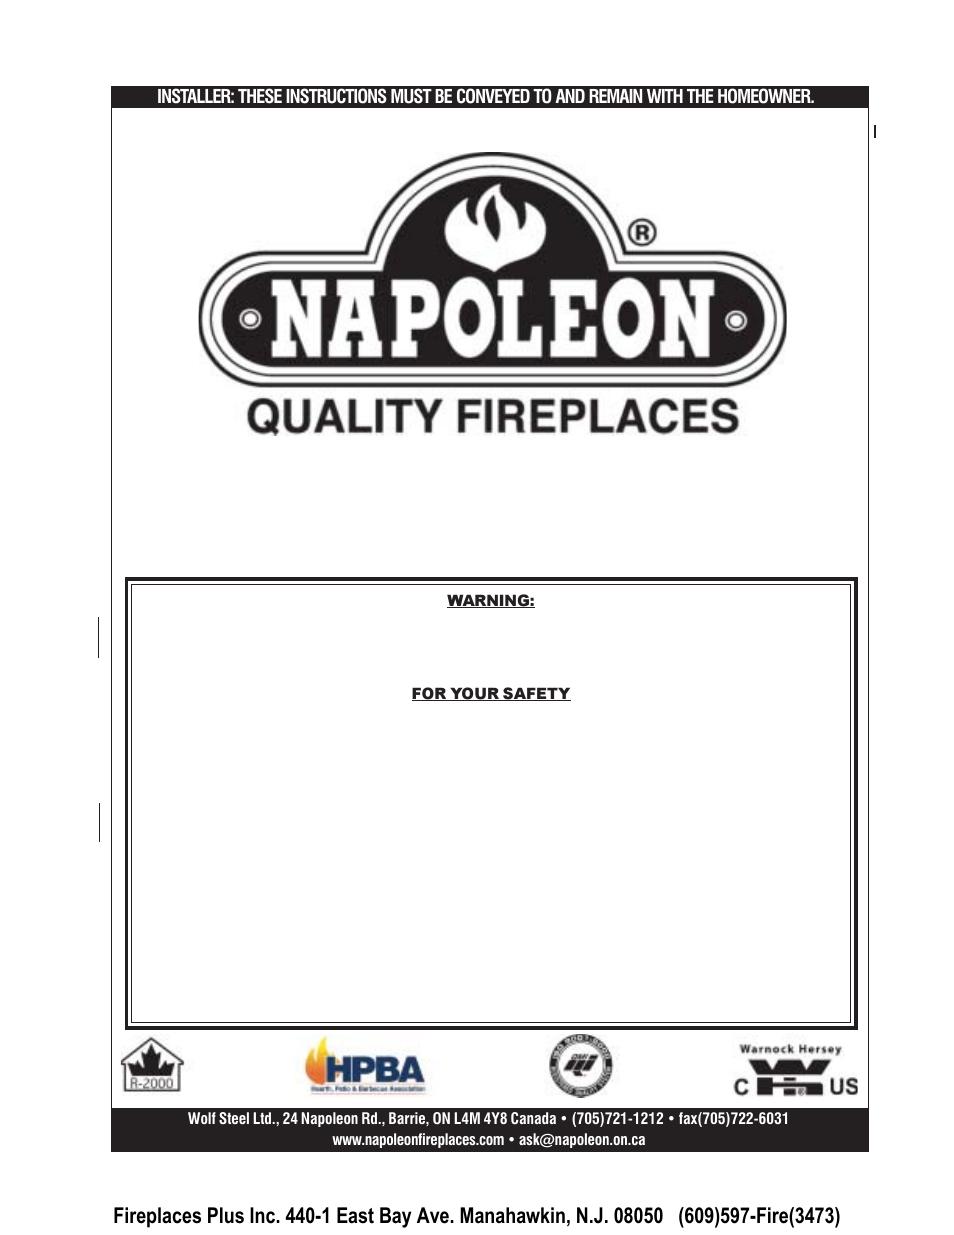 Napoleon Fireplaces Epi 1401 User Manual